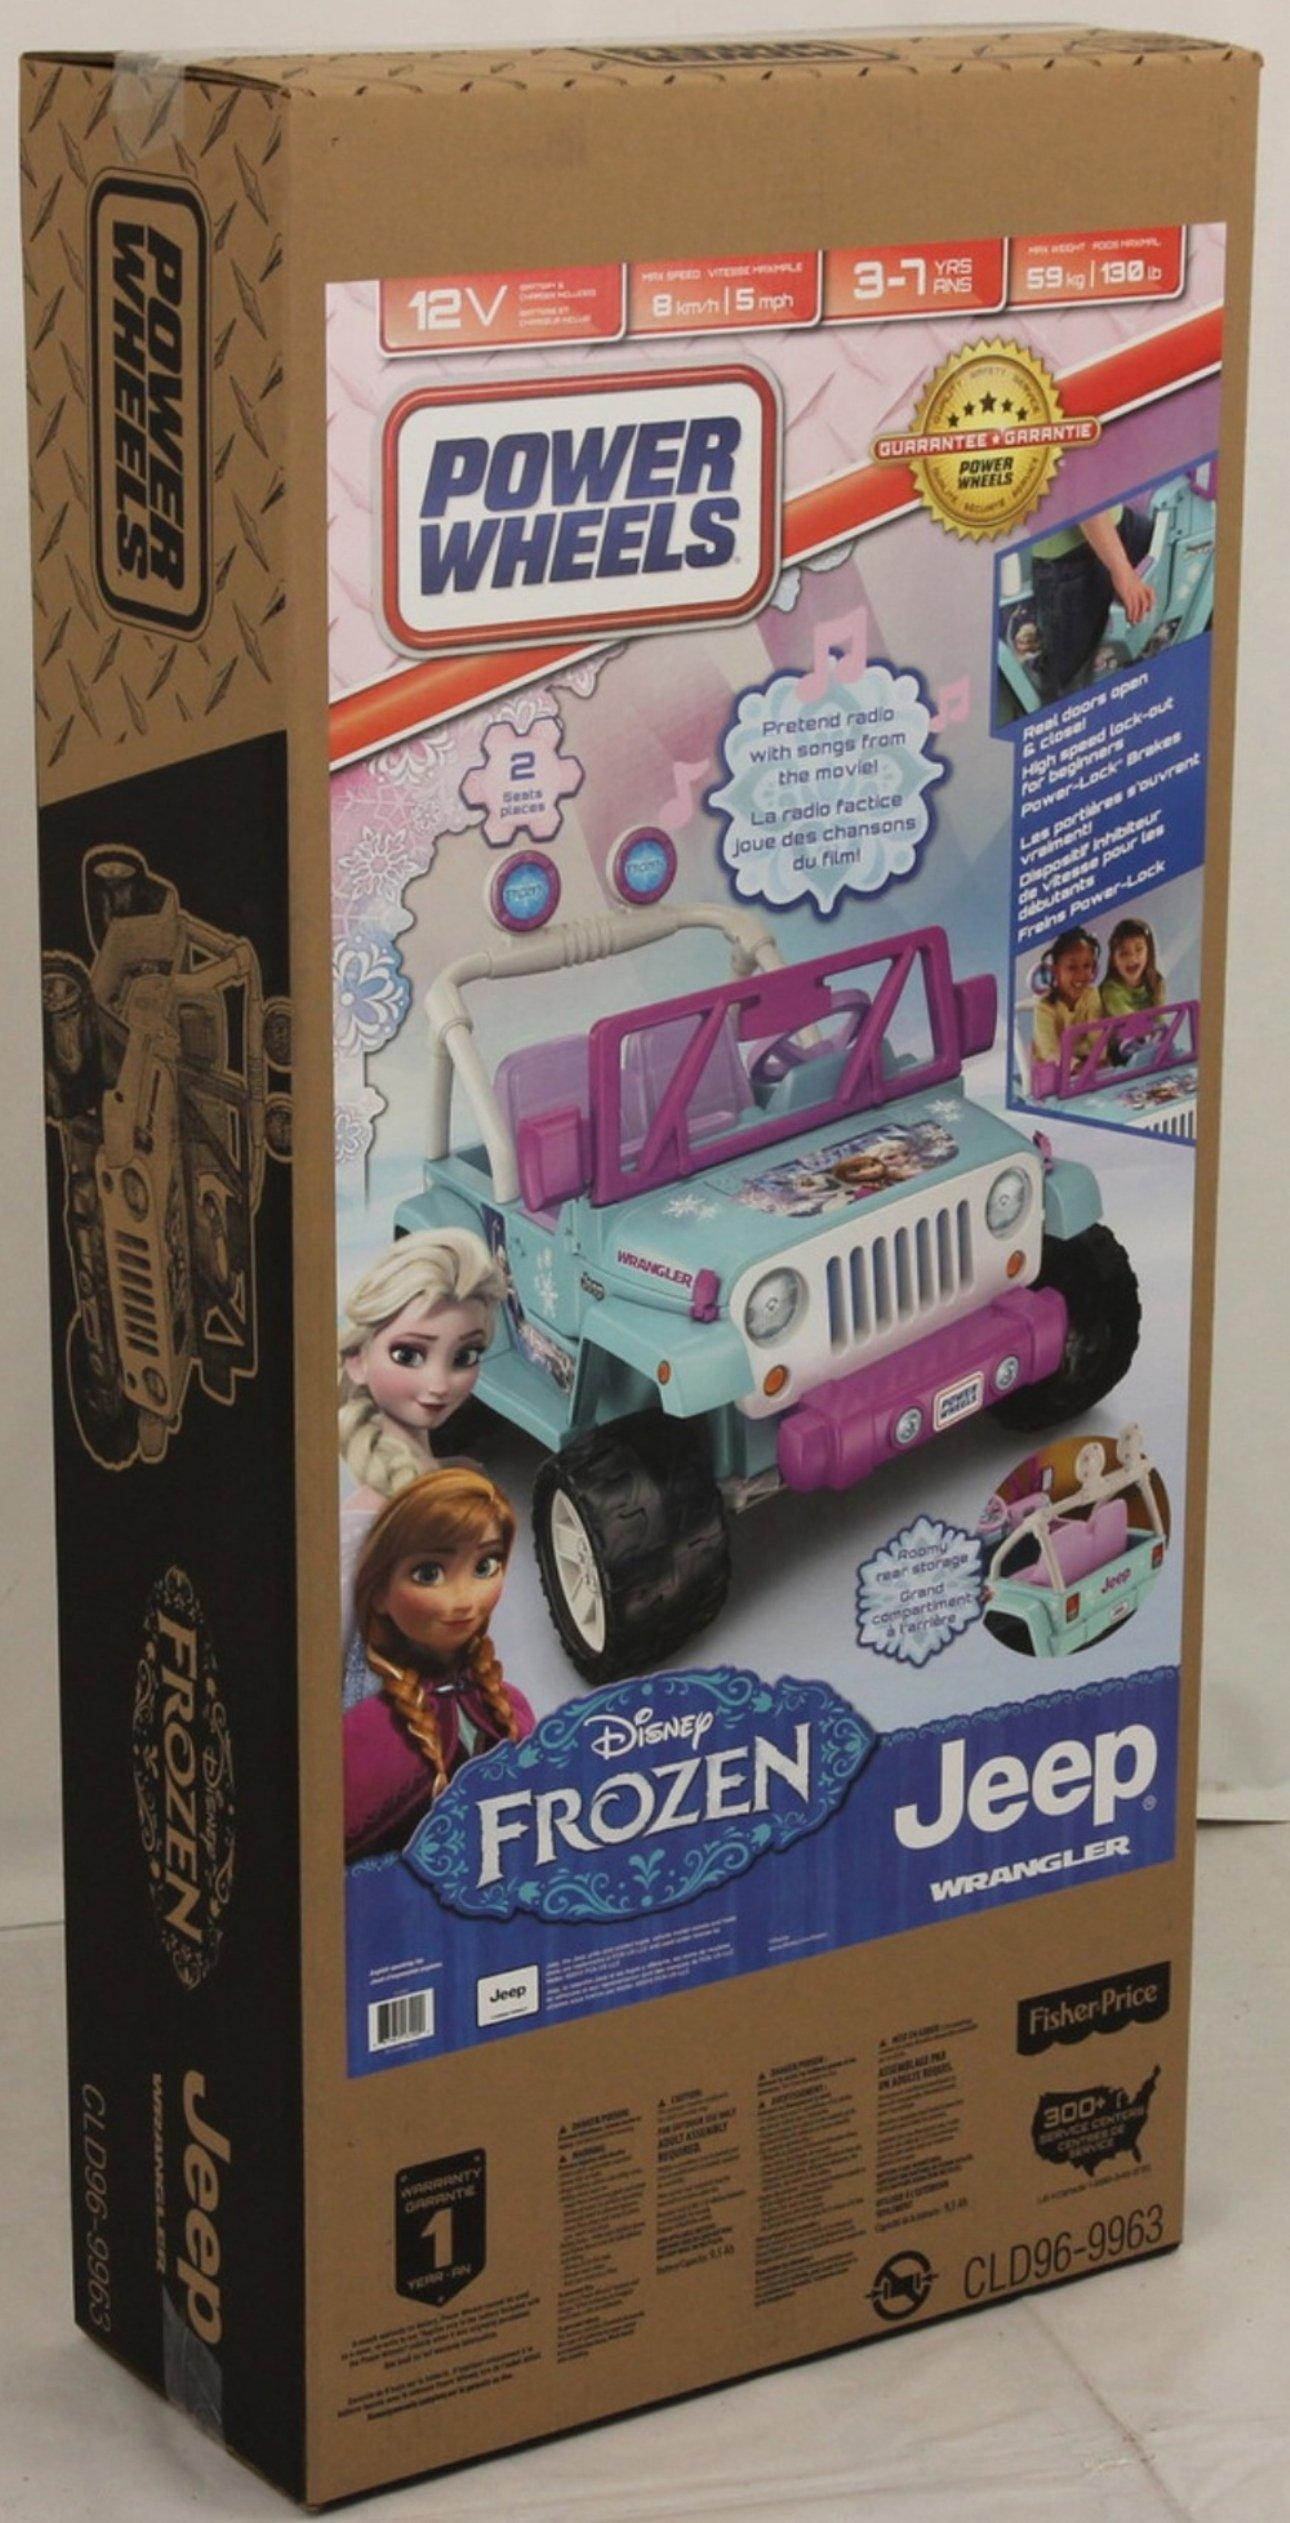 Power Wheels Disney Frozen Jeep Wrangler by Fisher-Price (Image #14)